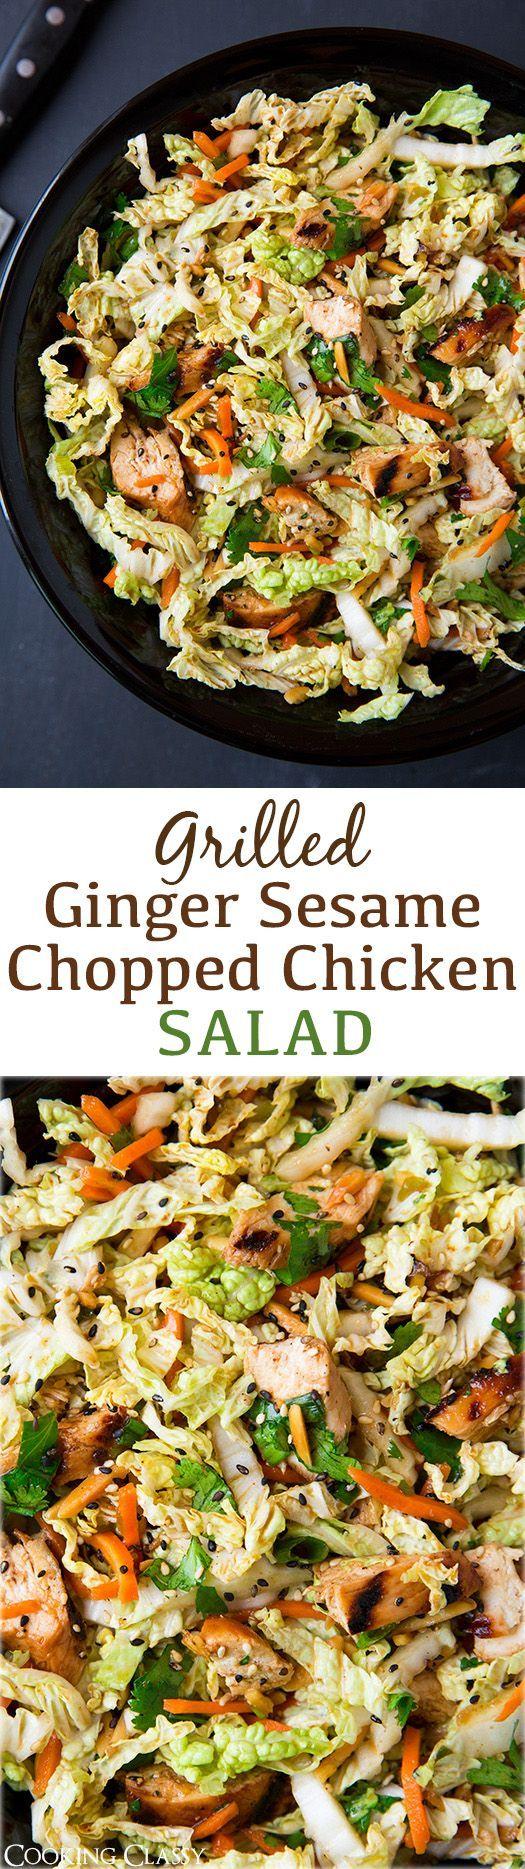 Grilled Ginger-Sesame Chicken Chopped Salad